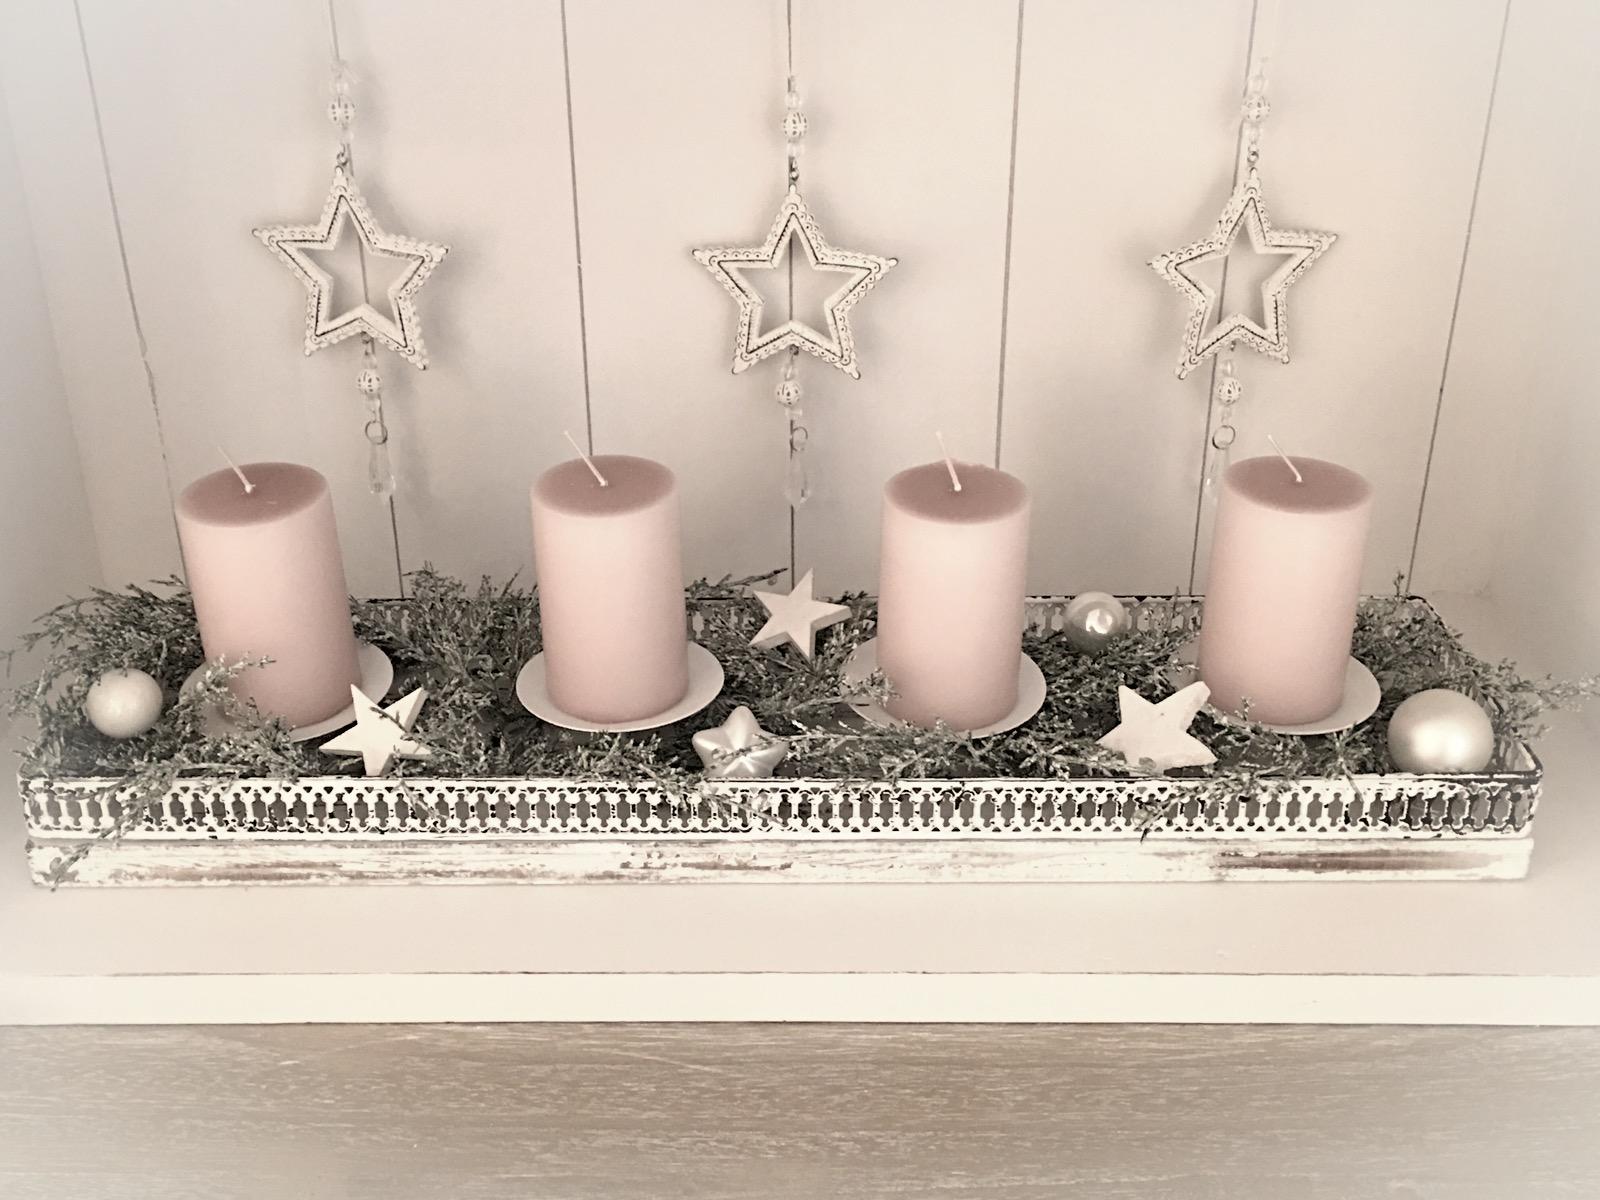 Tablett Mit 4 Kerzen Dekoriert 5939 Neu Aktuell Atelier Roosarot